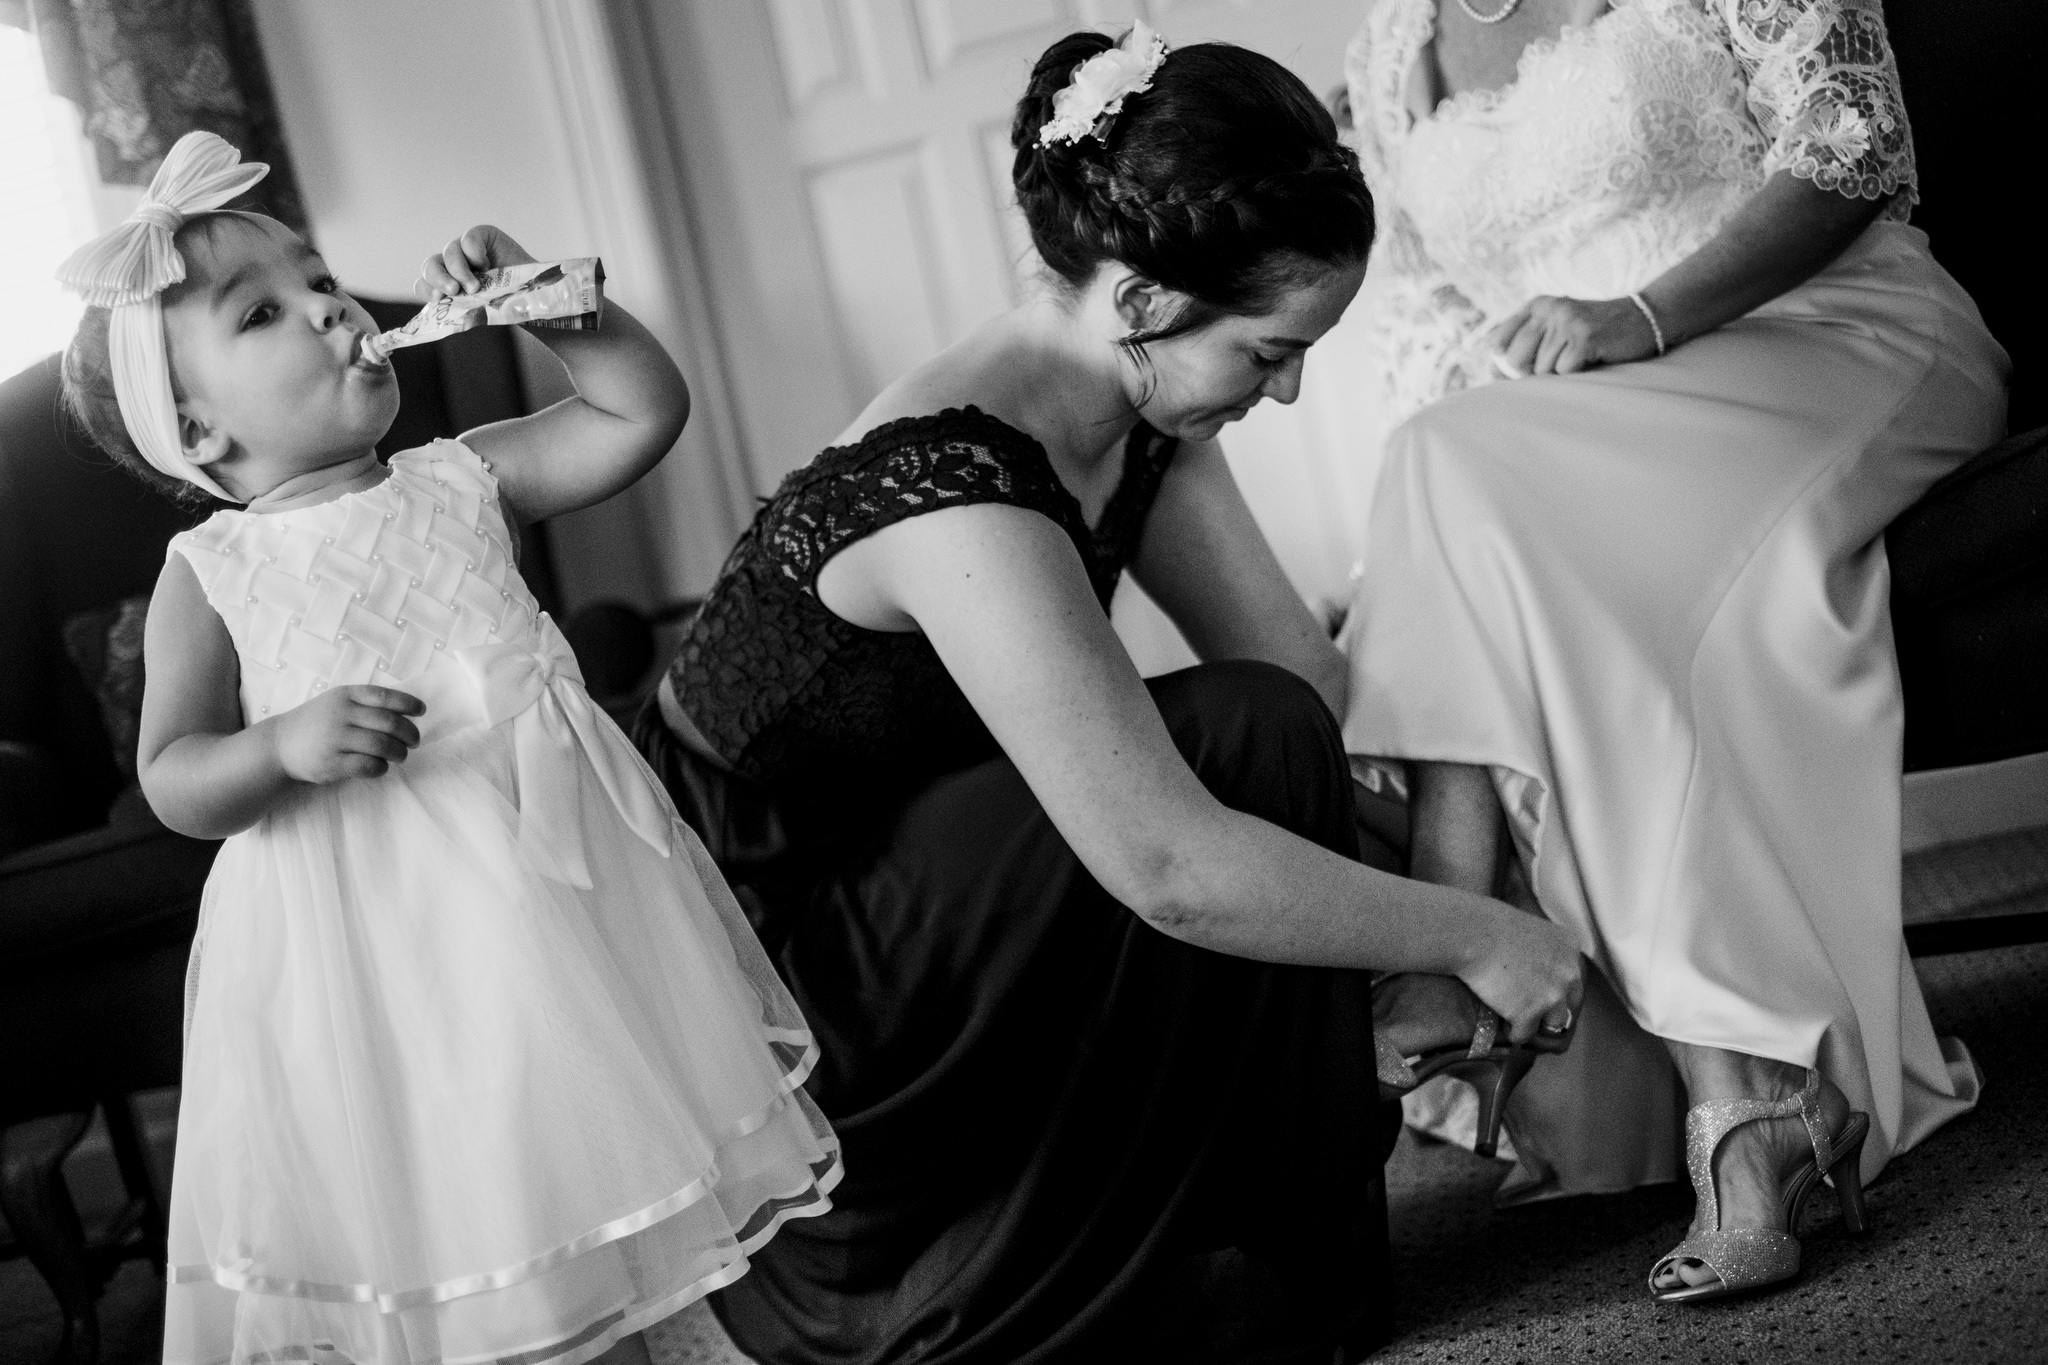 Cindy and Steve's wedding in Murray, Kentucky.